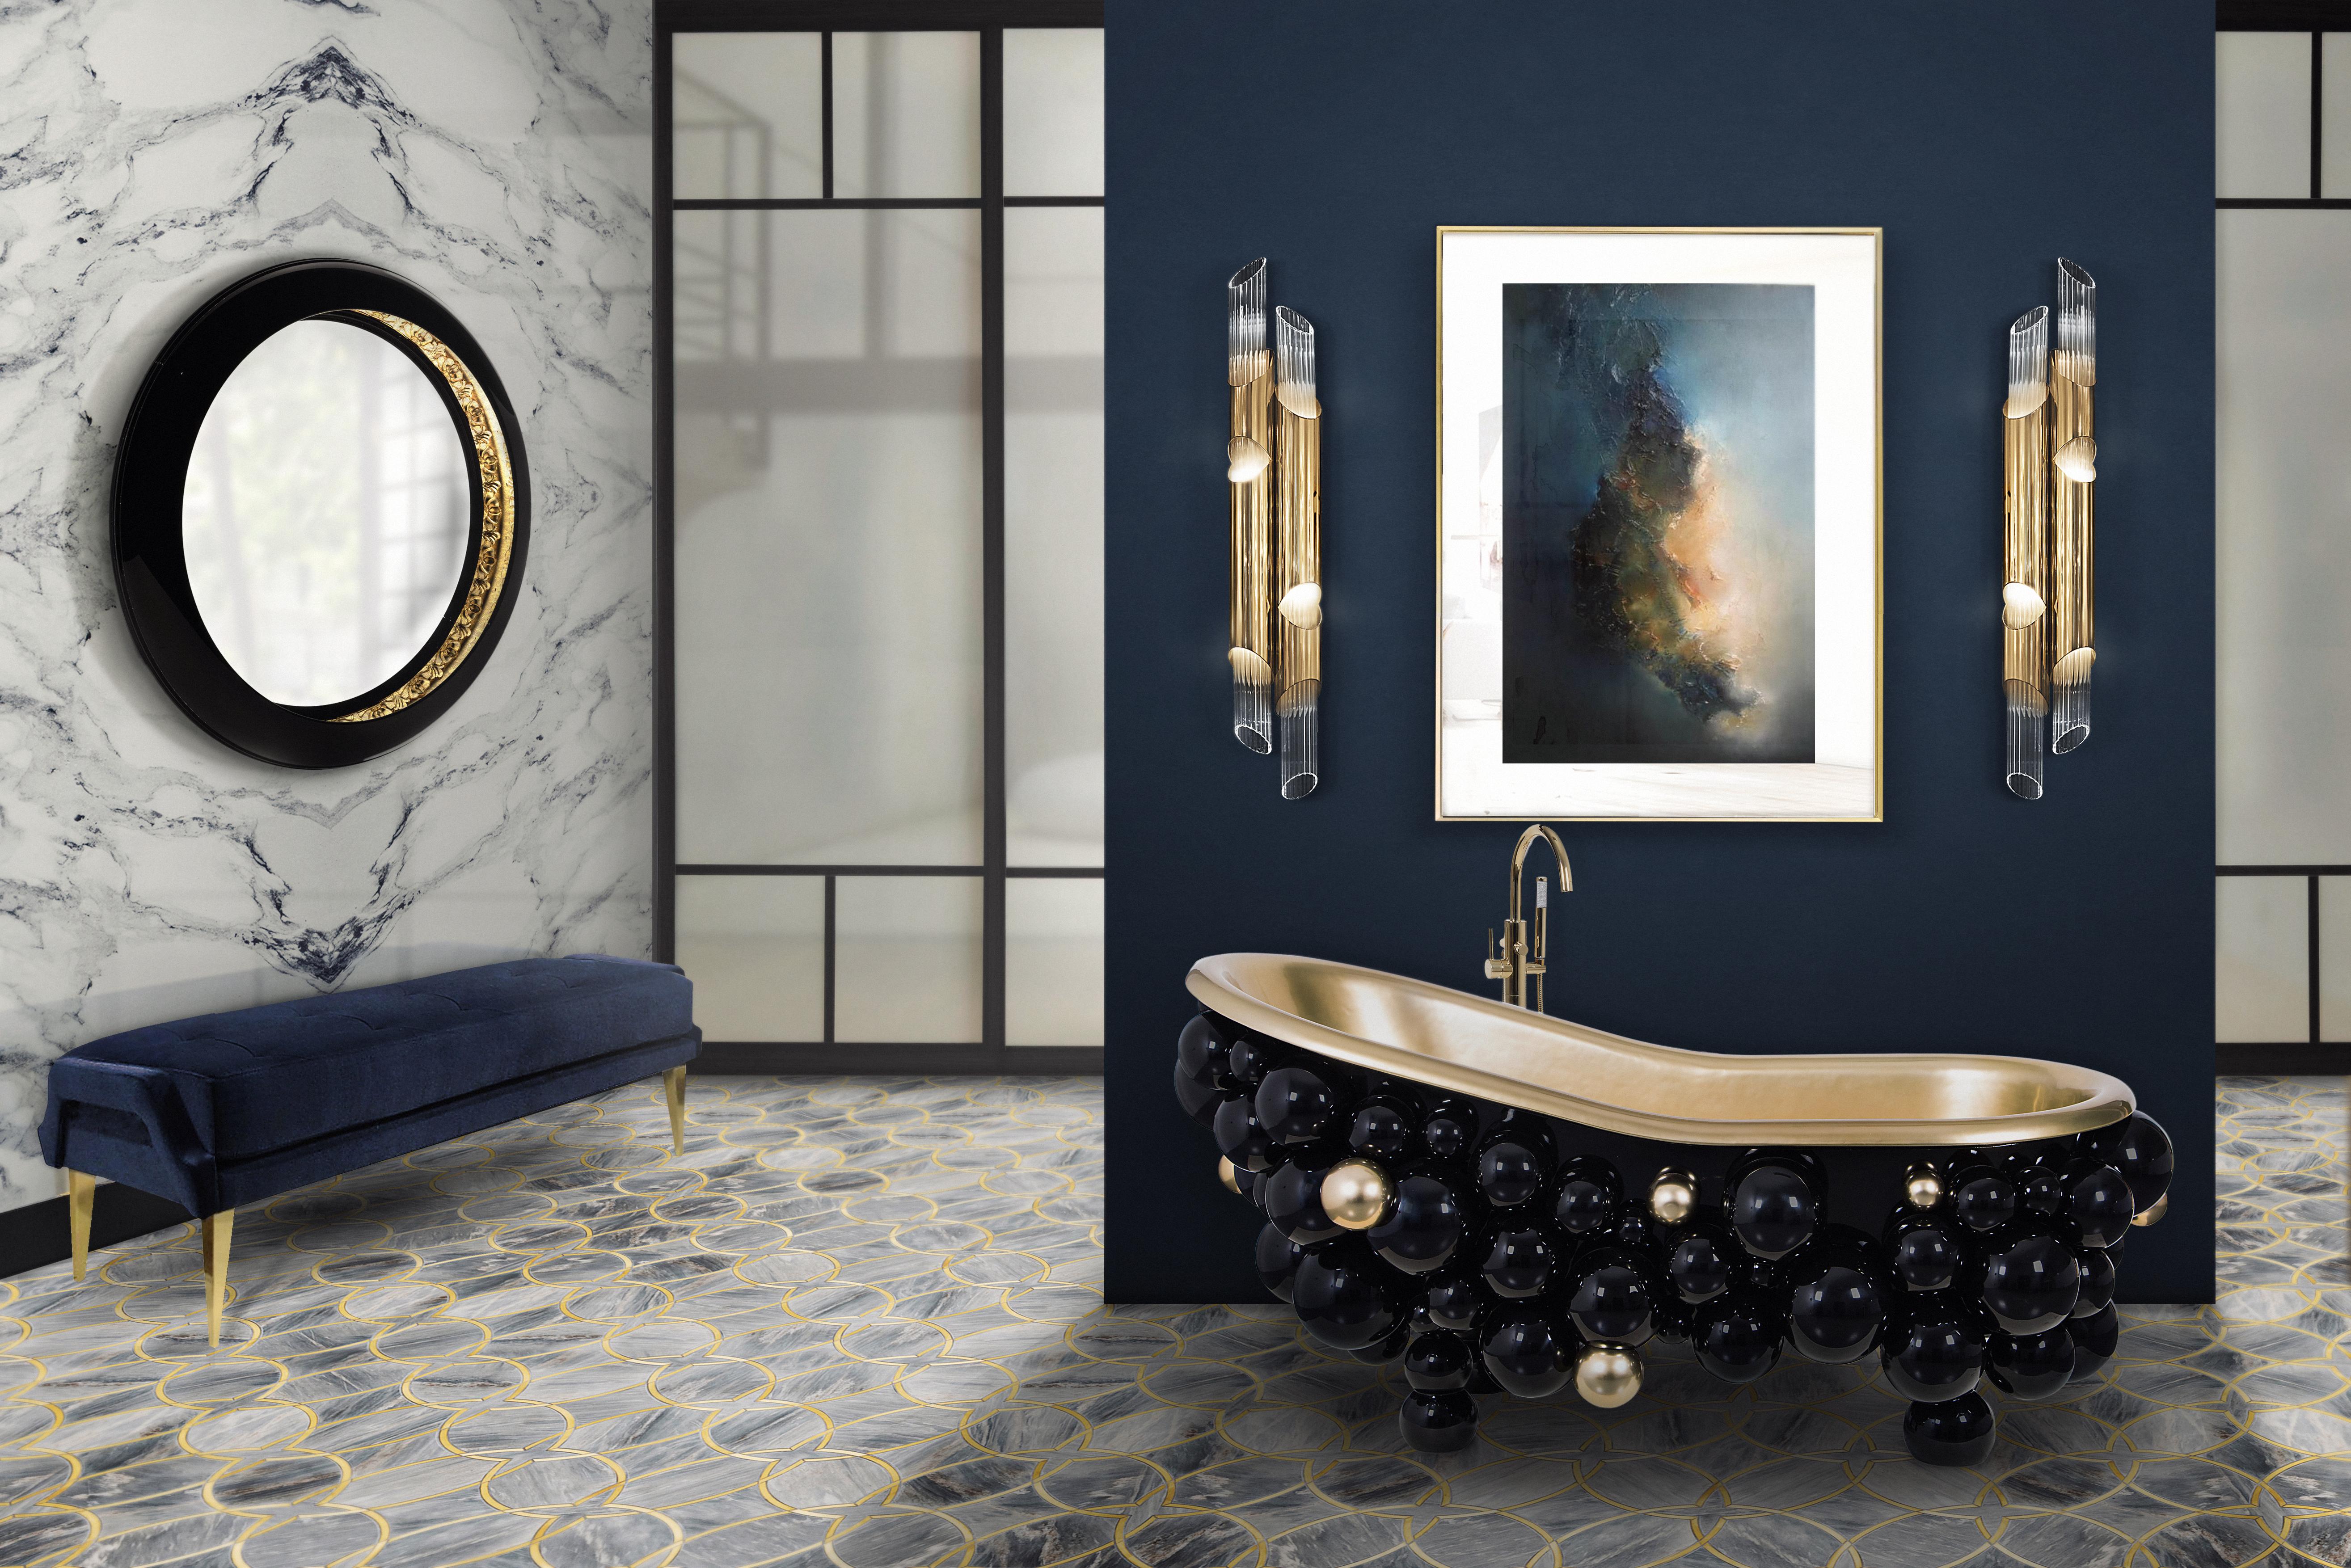 Shake up your bathroom with Maison Valentina´s luxurious bathtubs luxurious bathtubs Shake up your bathroom with Maison Valentina´s luxurious bathtubs 26 newton bathtub ring mirror 1 HR